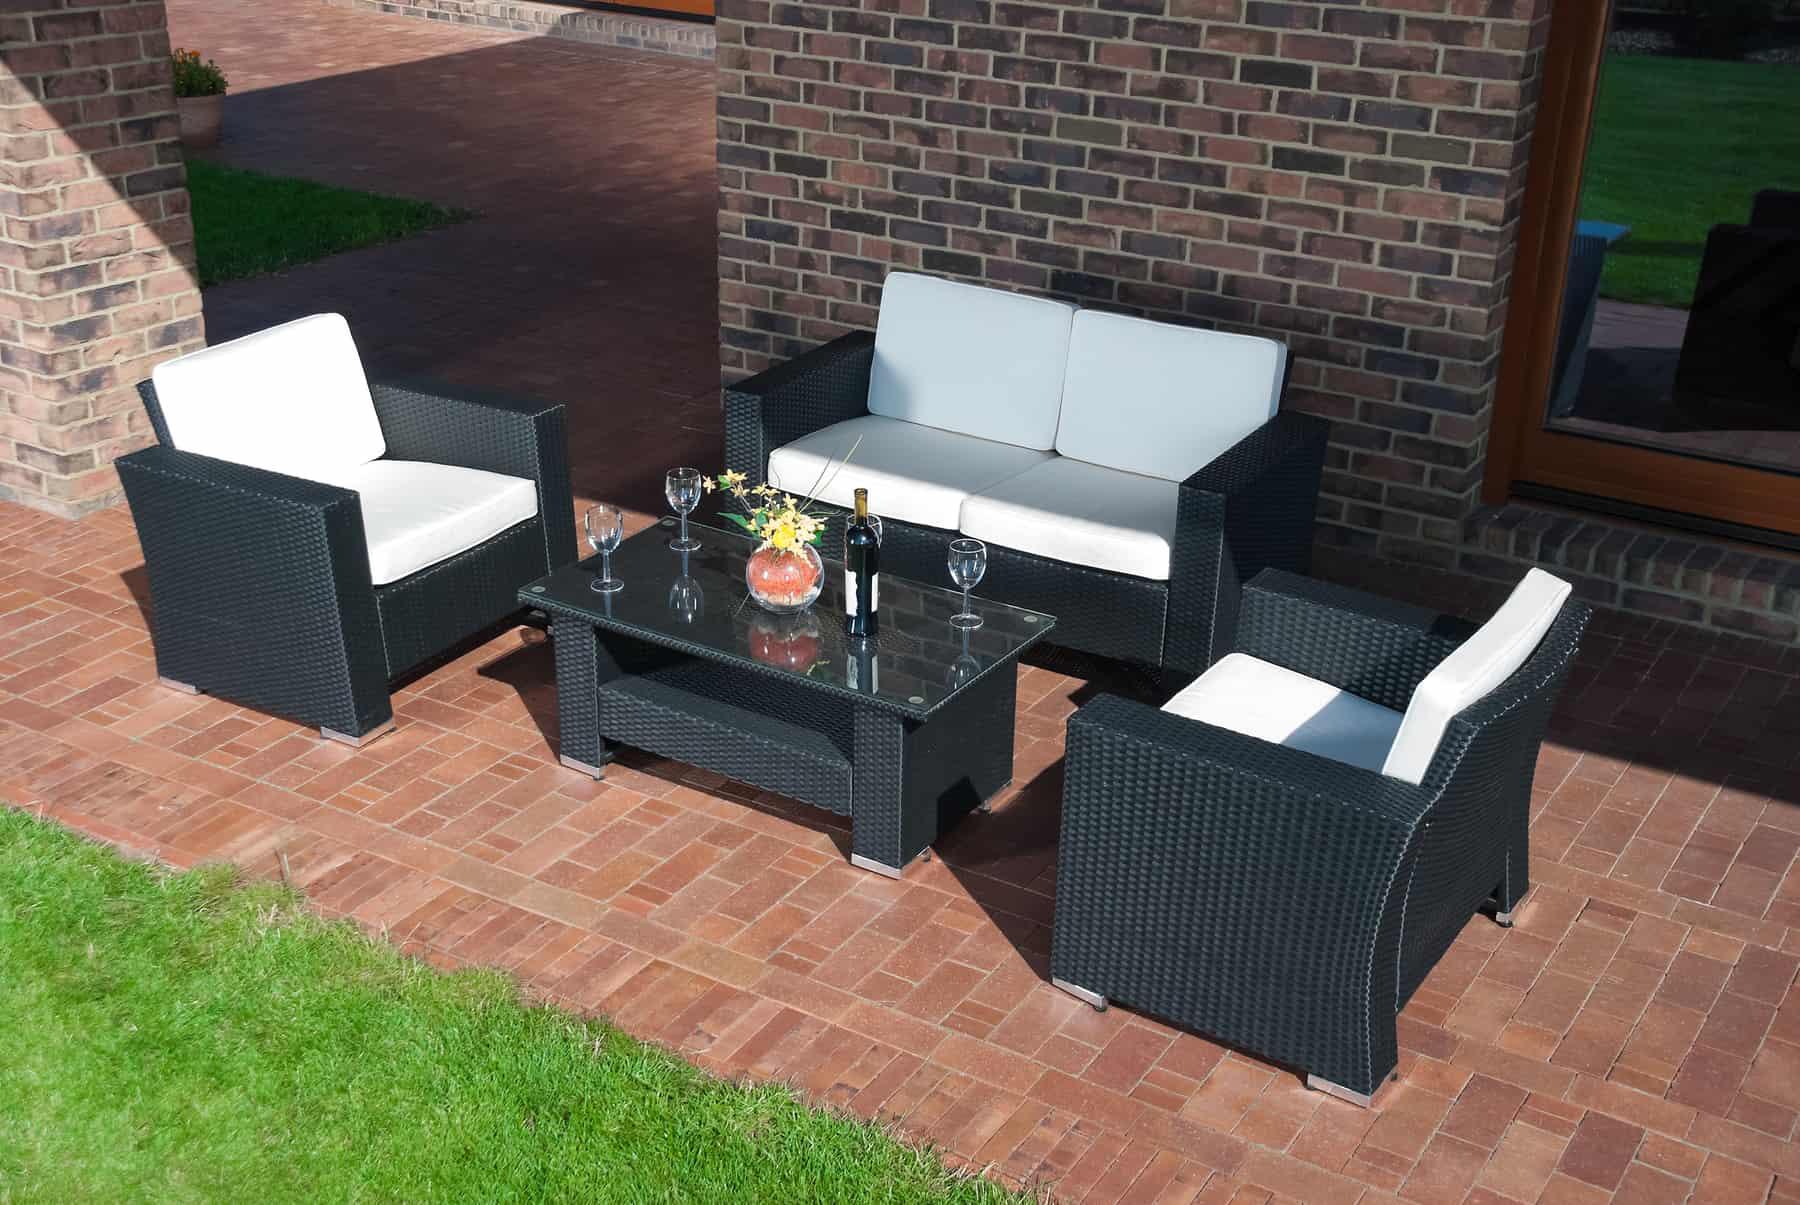 A contemporary garden needs modern furniture